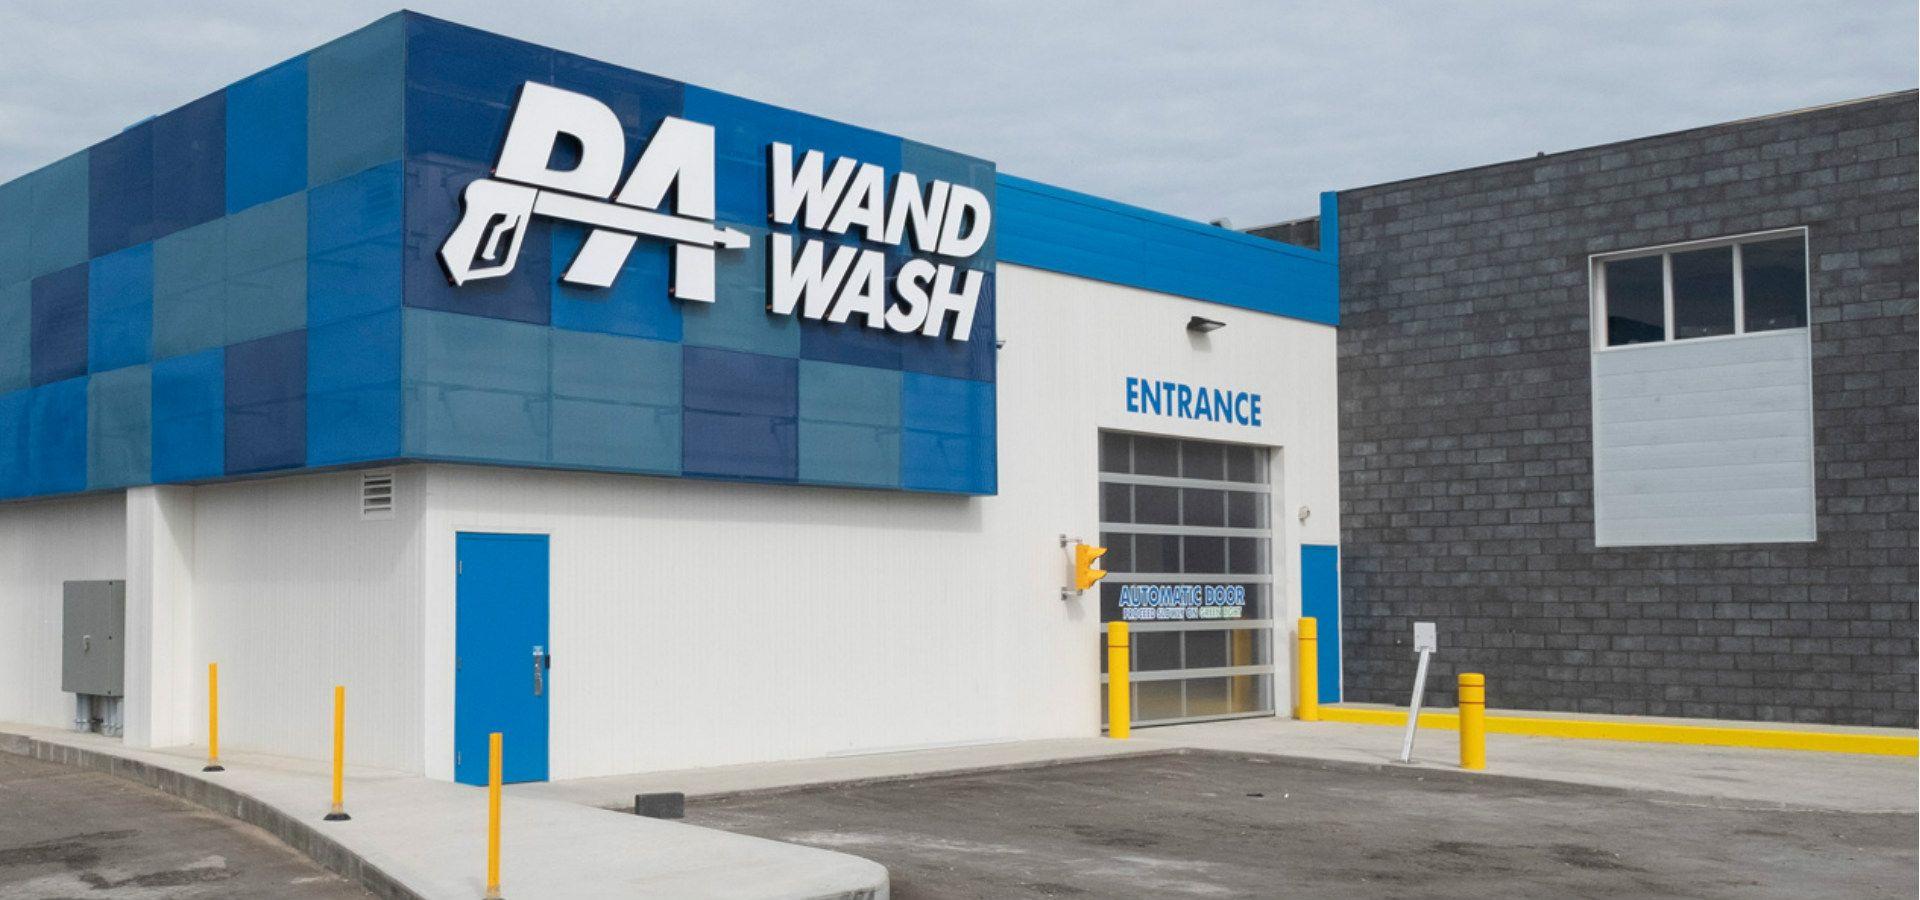 PA Wand Wash Offers Cutting Edge Service